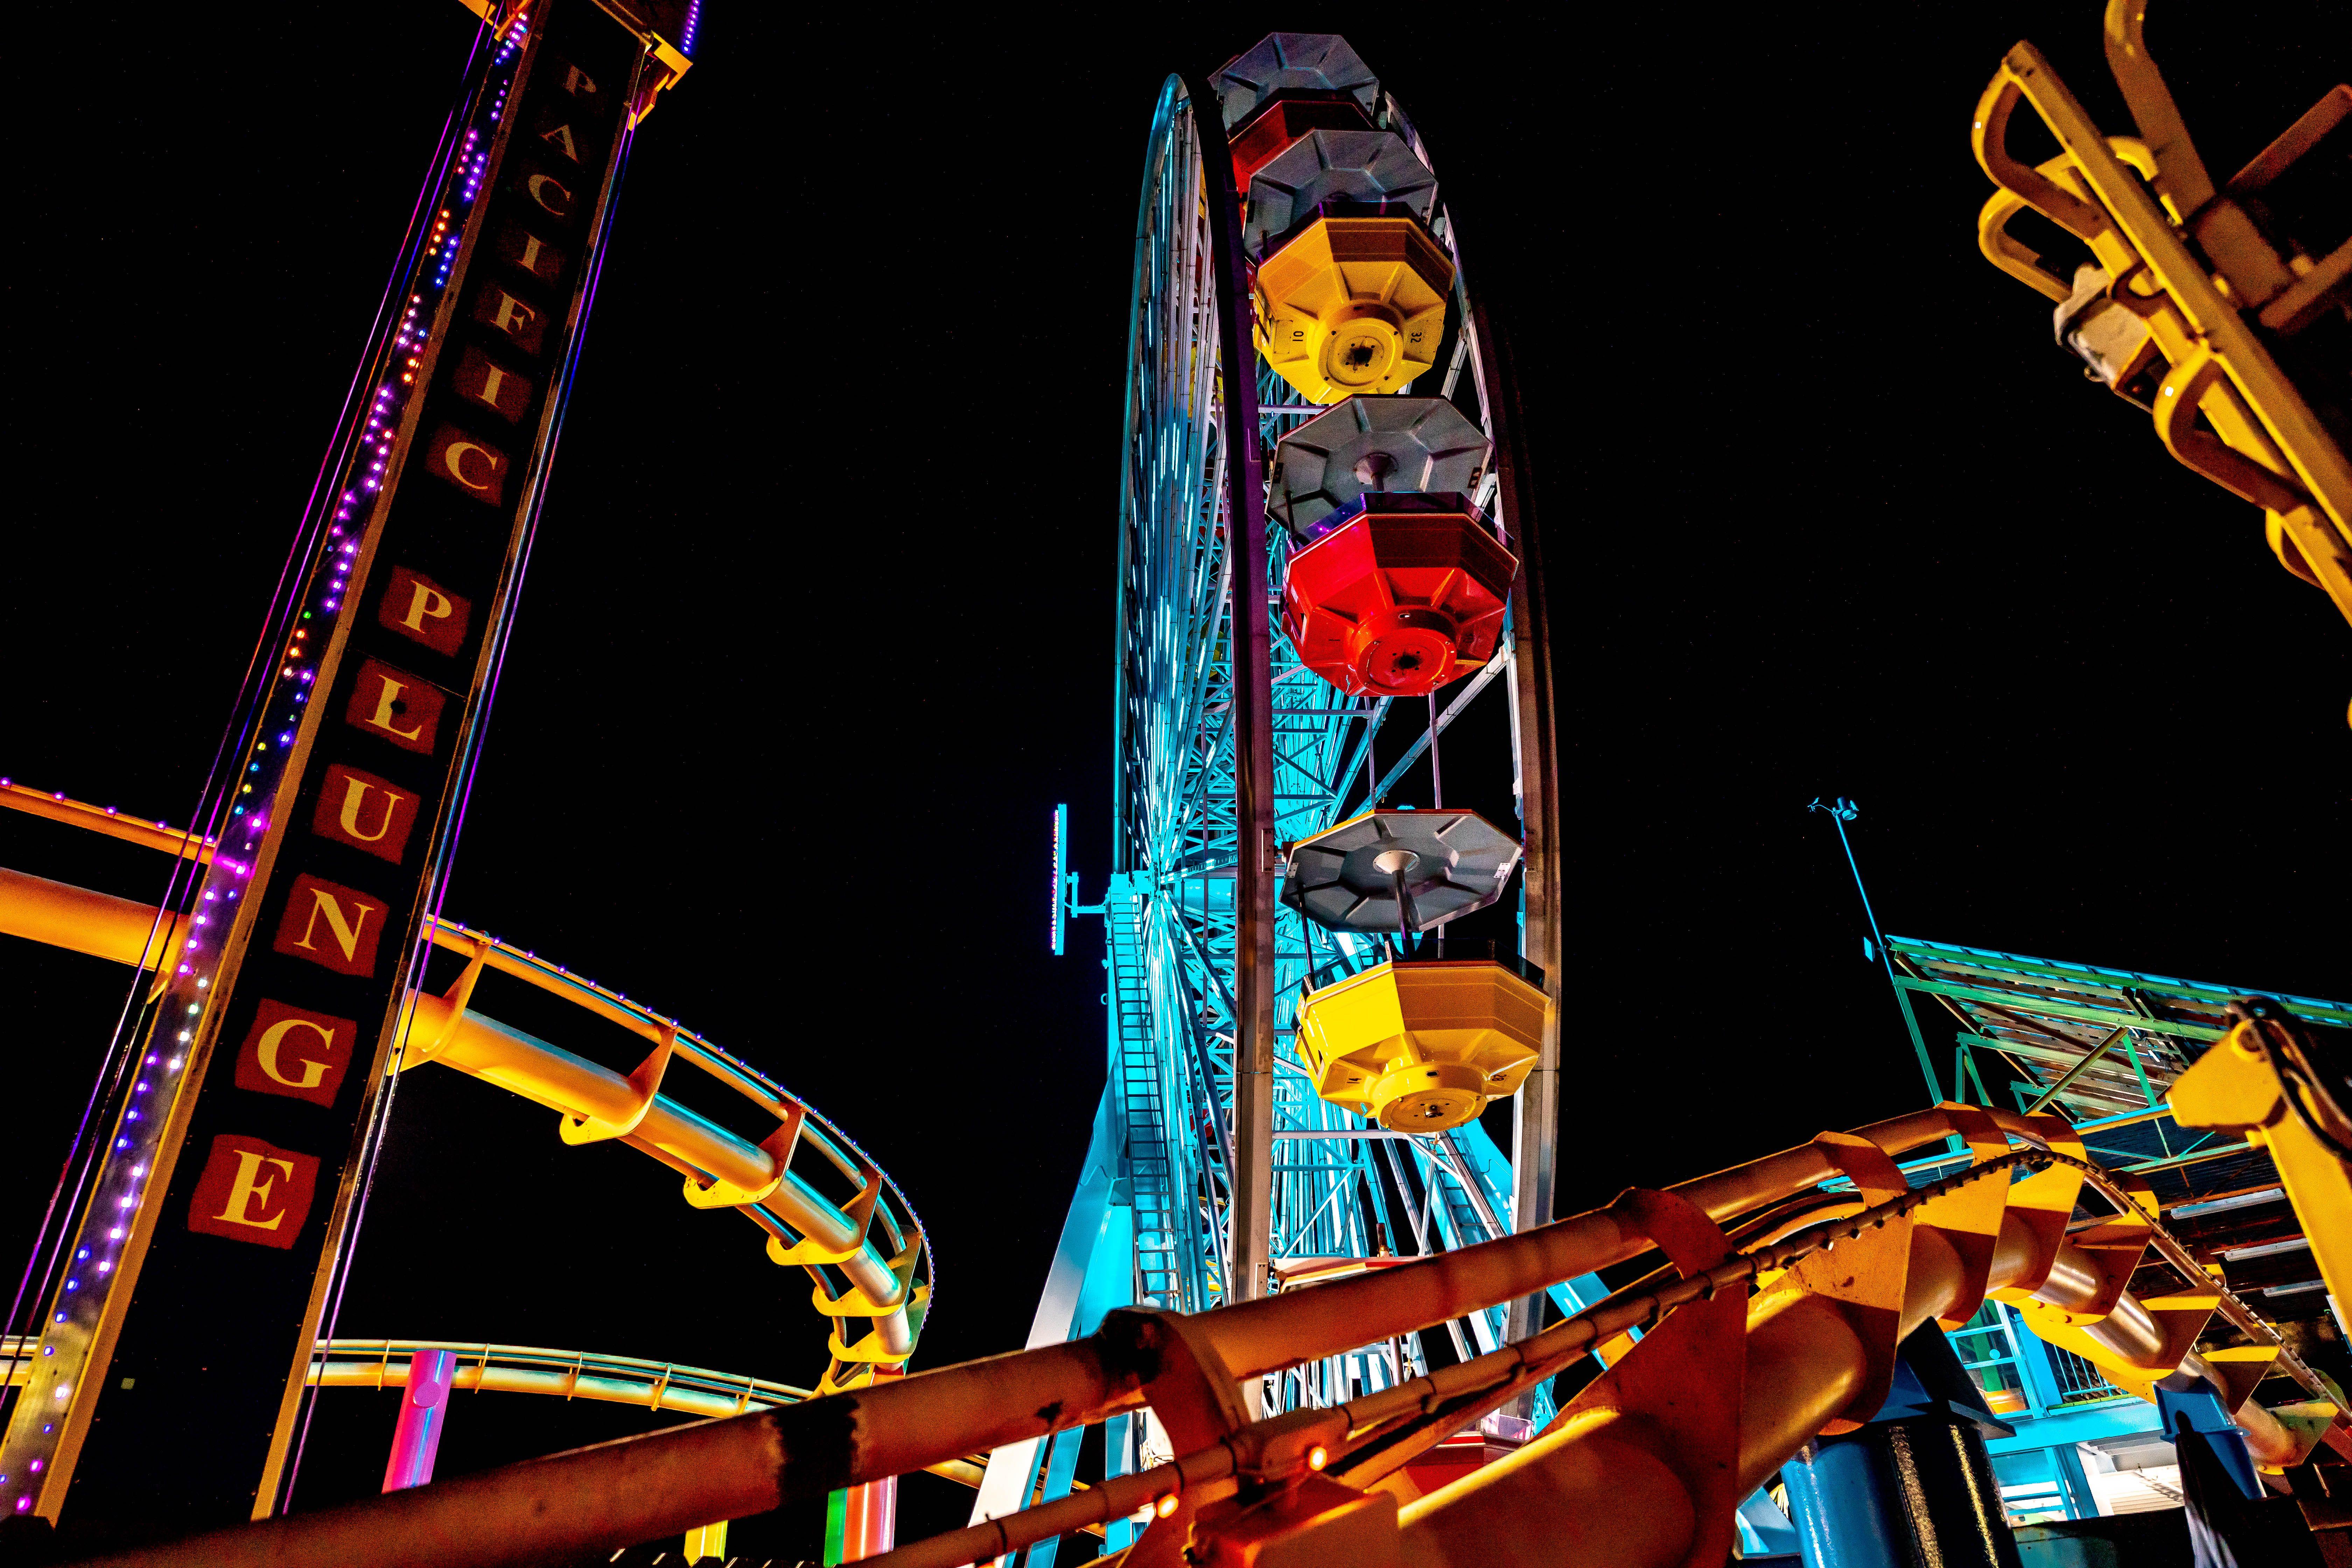 The Santa Monica Pier lit up at night